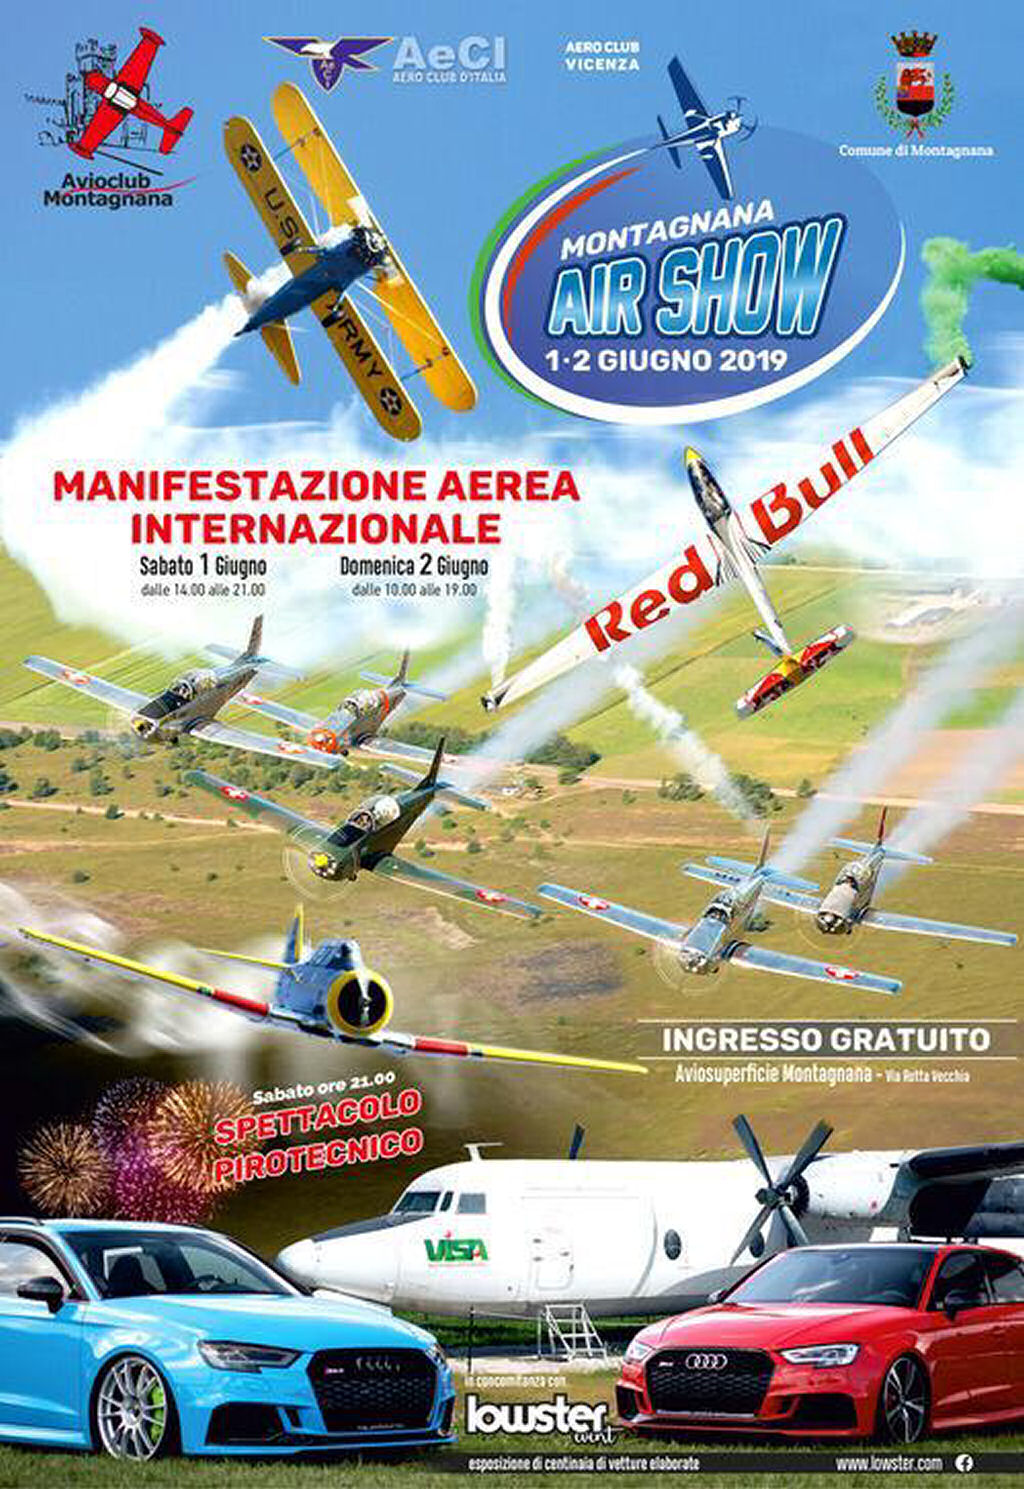 Montagnana Airshow 2019